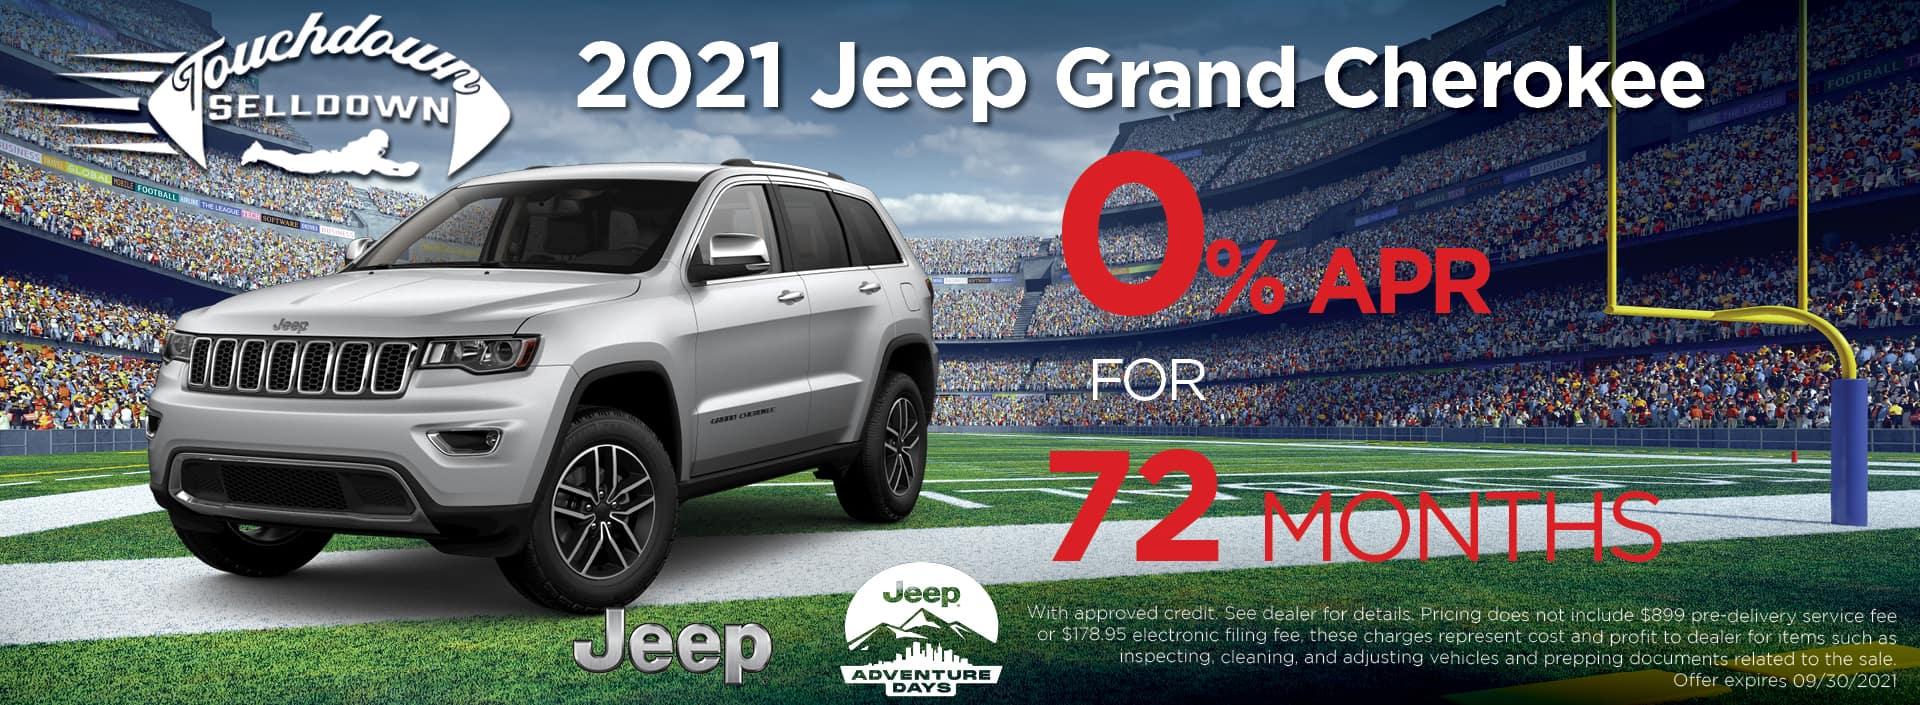 Jeep GC Zero pct